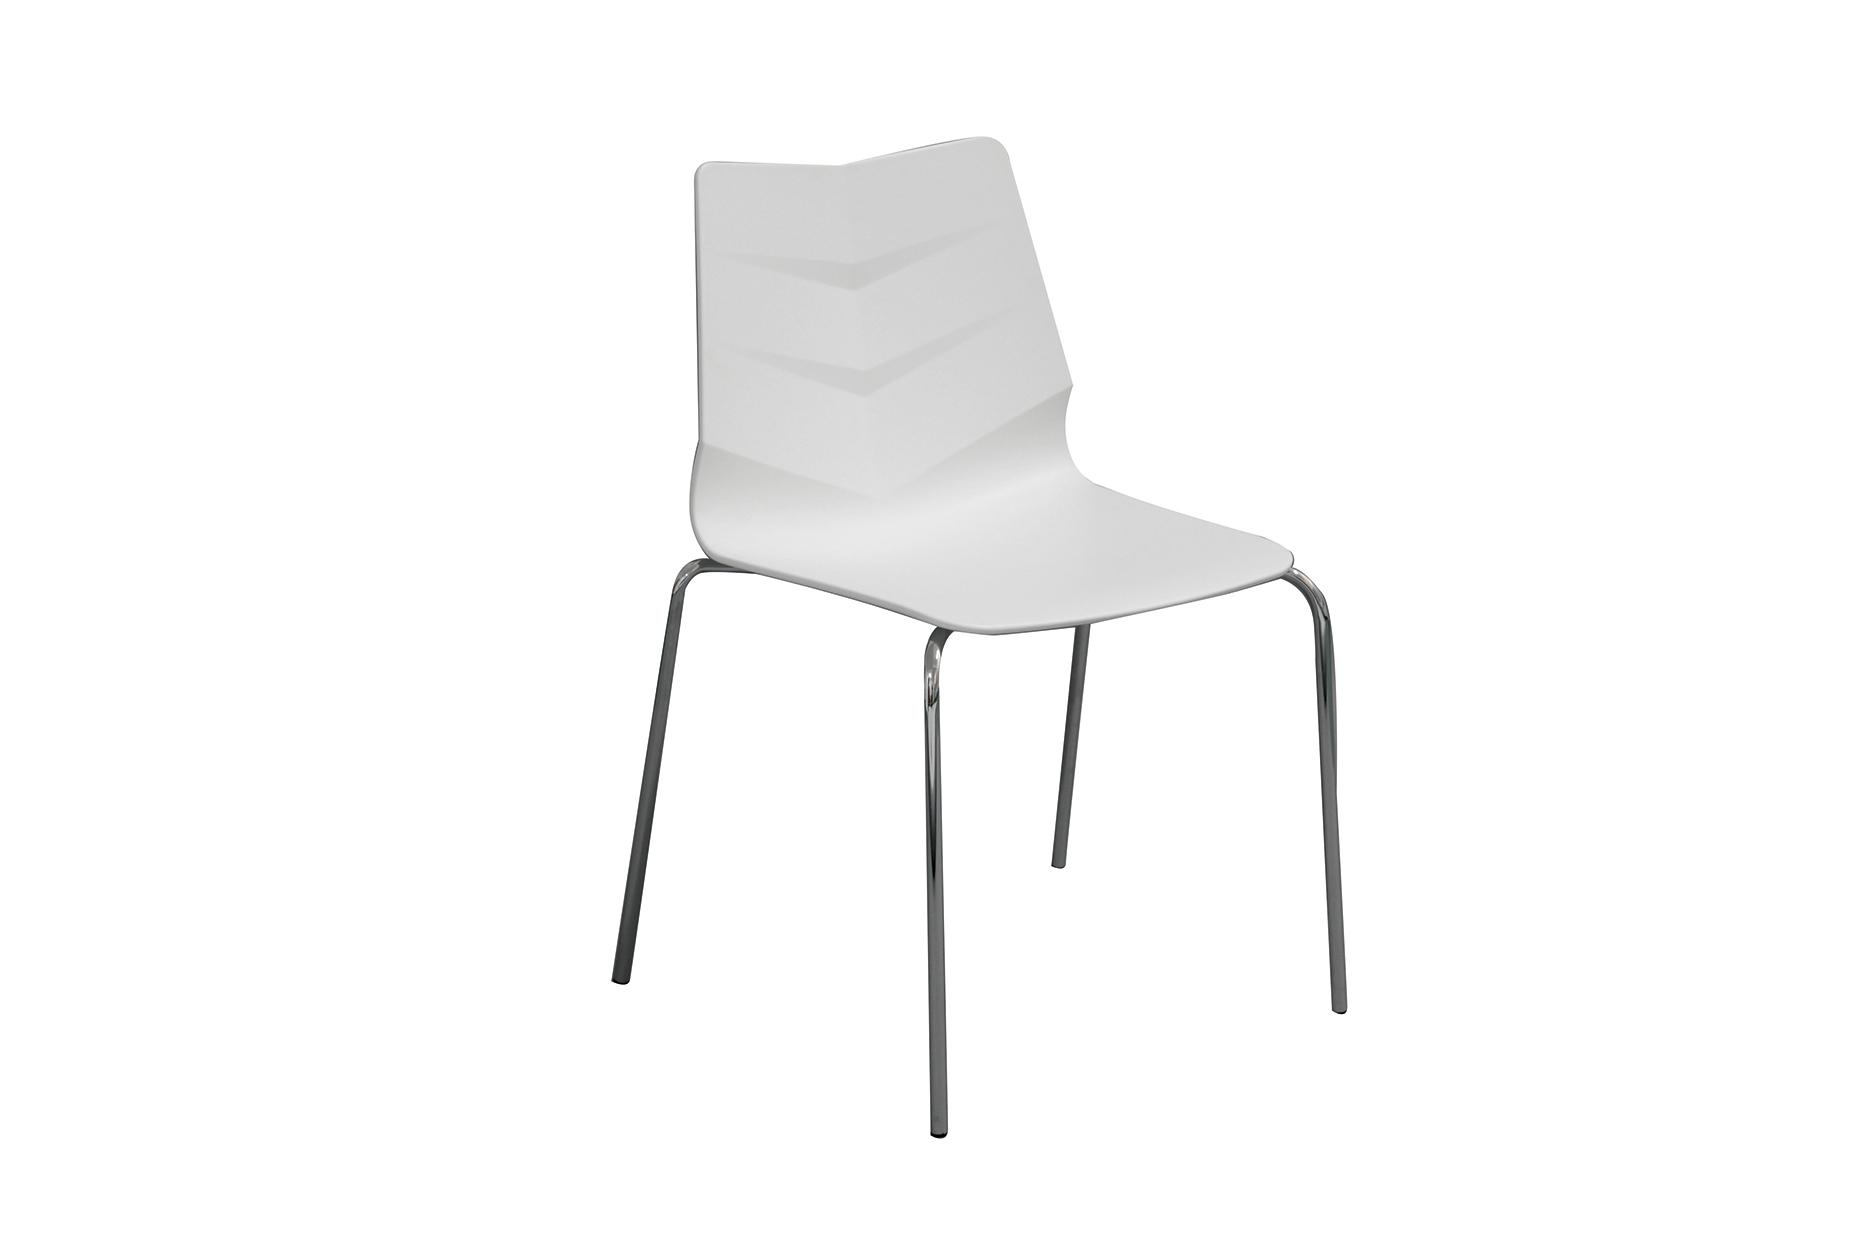 Стул LEAF-01 белыйОбеденные стулья<br><br><br>Material: Пластик<br>Width см: 57<br>Depth см: 52<br>Height см: 83